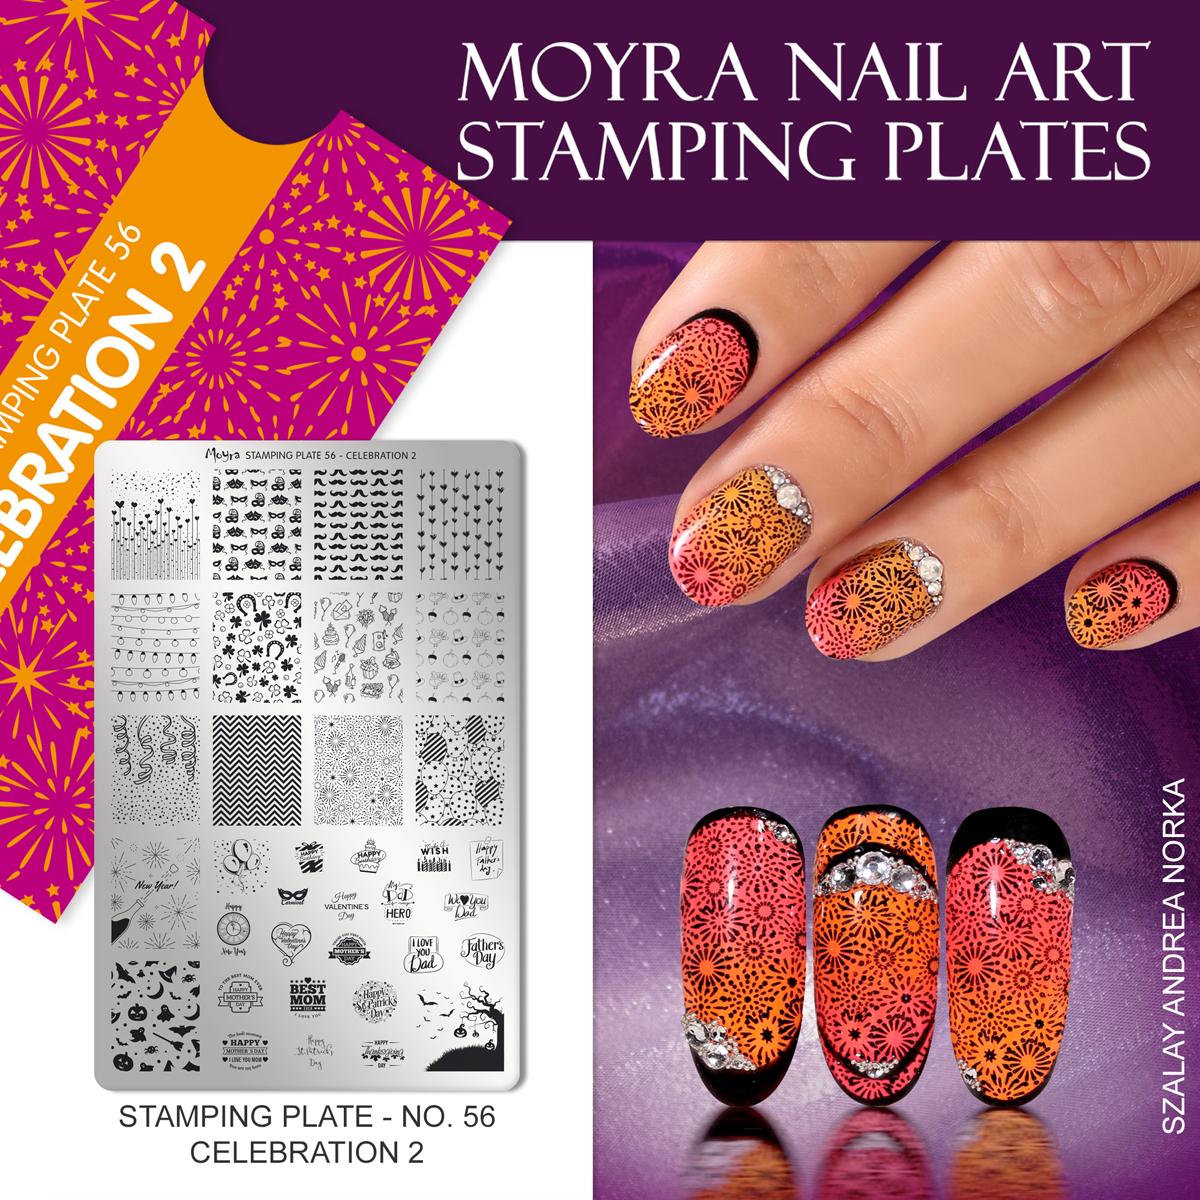 Moyra Nail Art Stamping Plate No. 56 Celebration 2